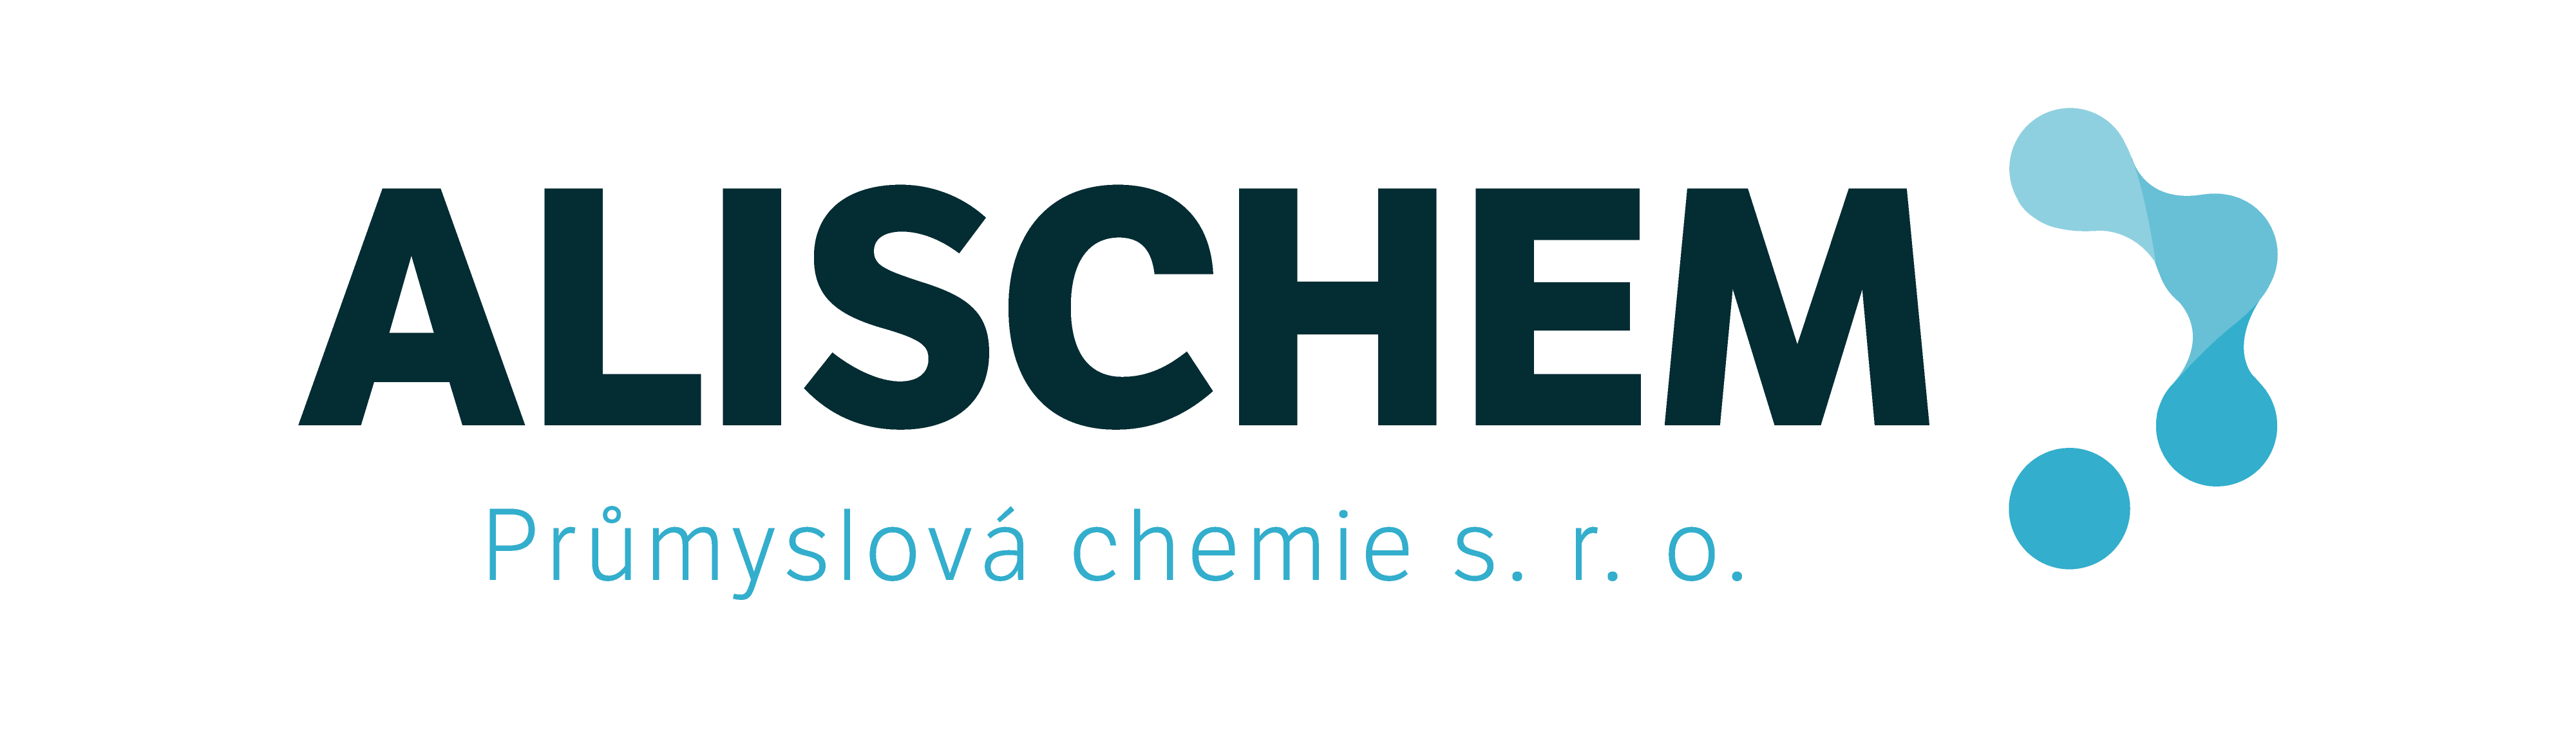 Alischem - Průmyslová chemie s.r.o.